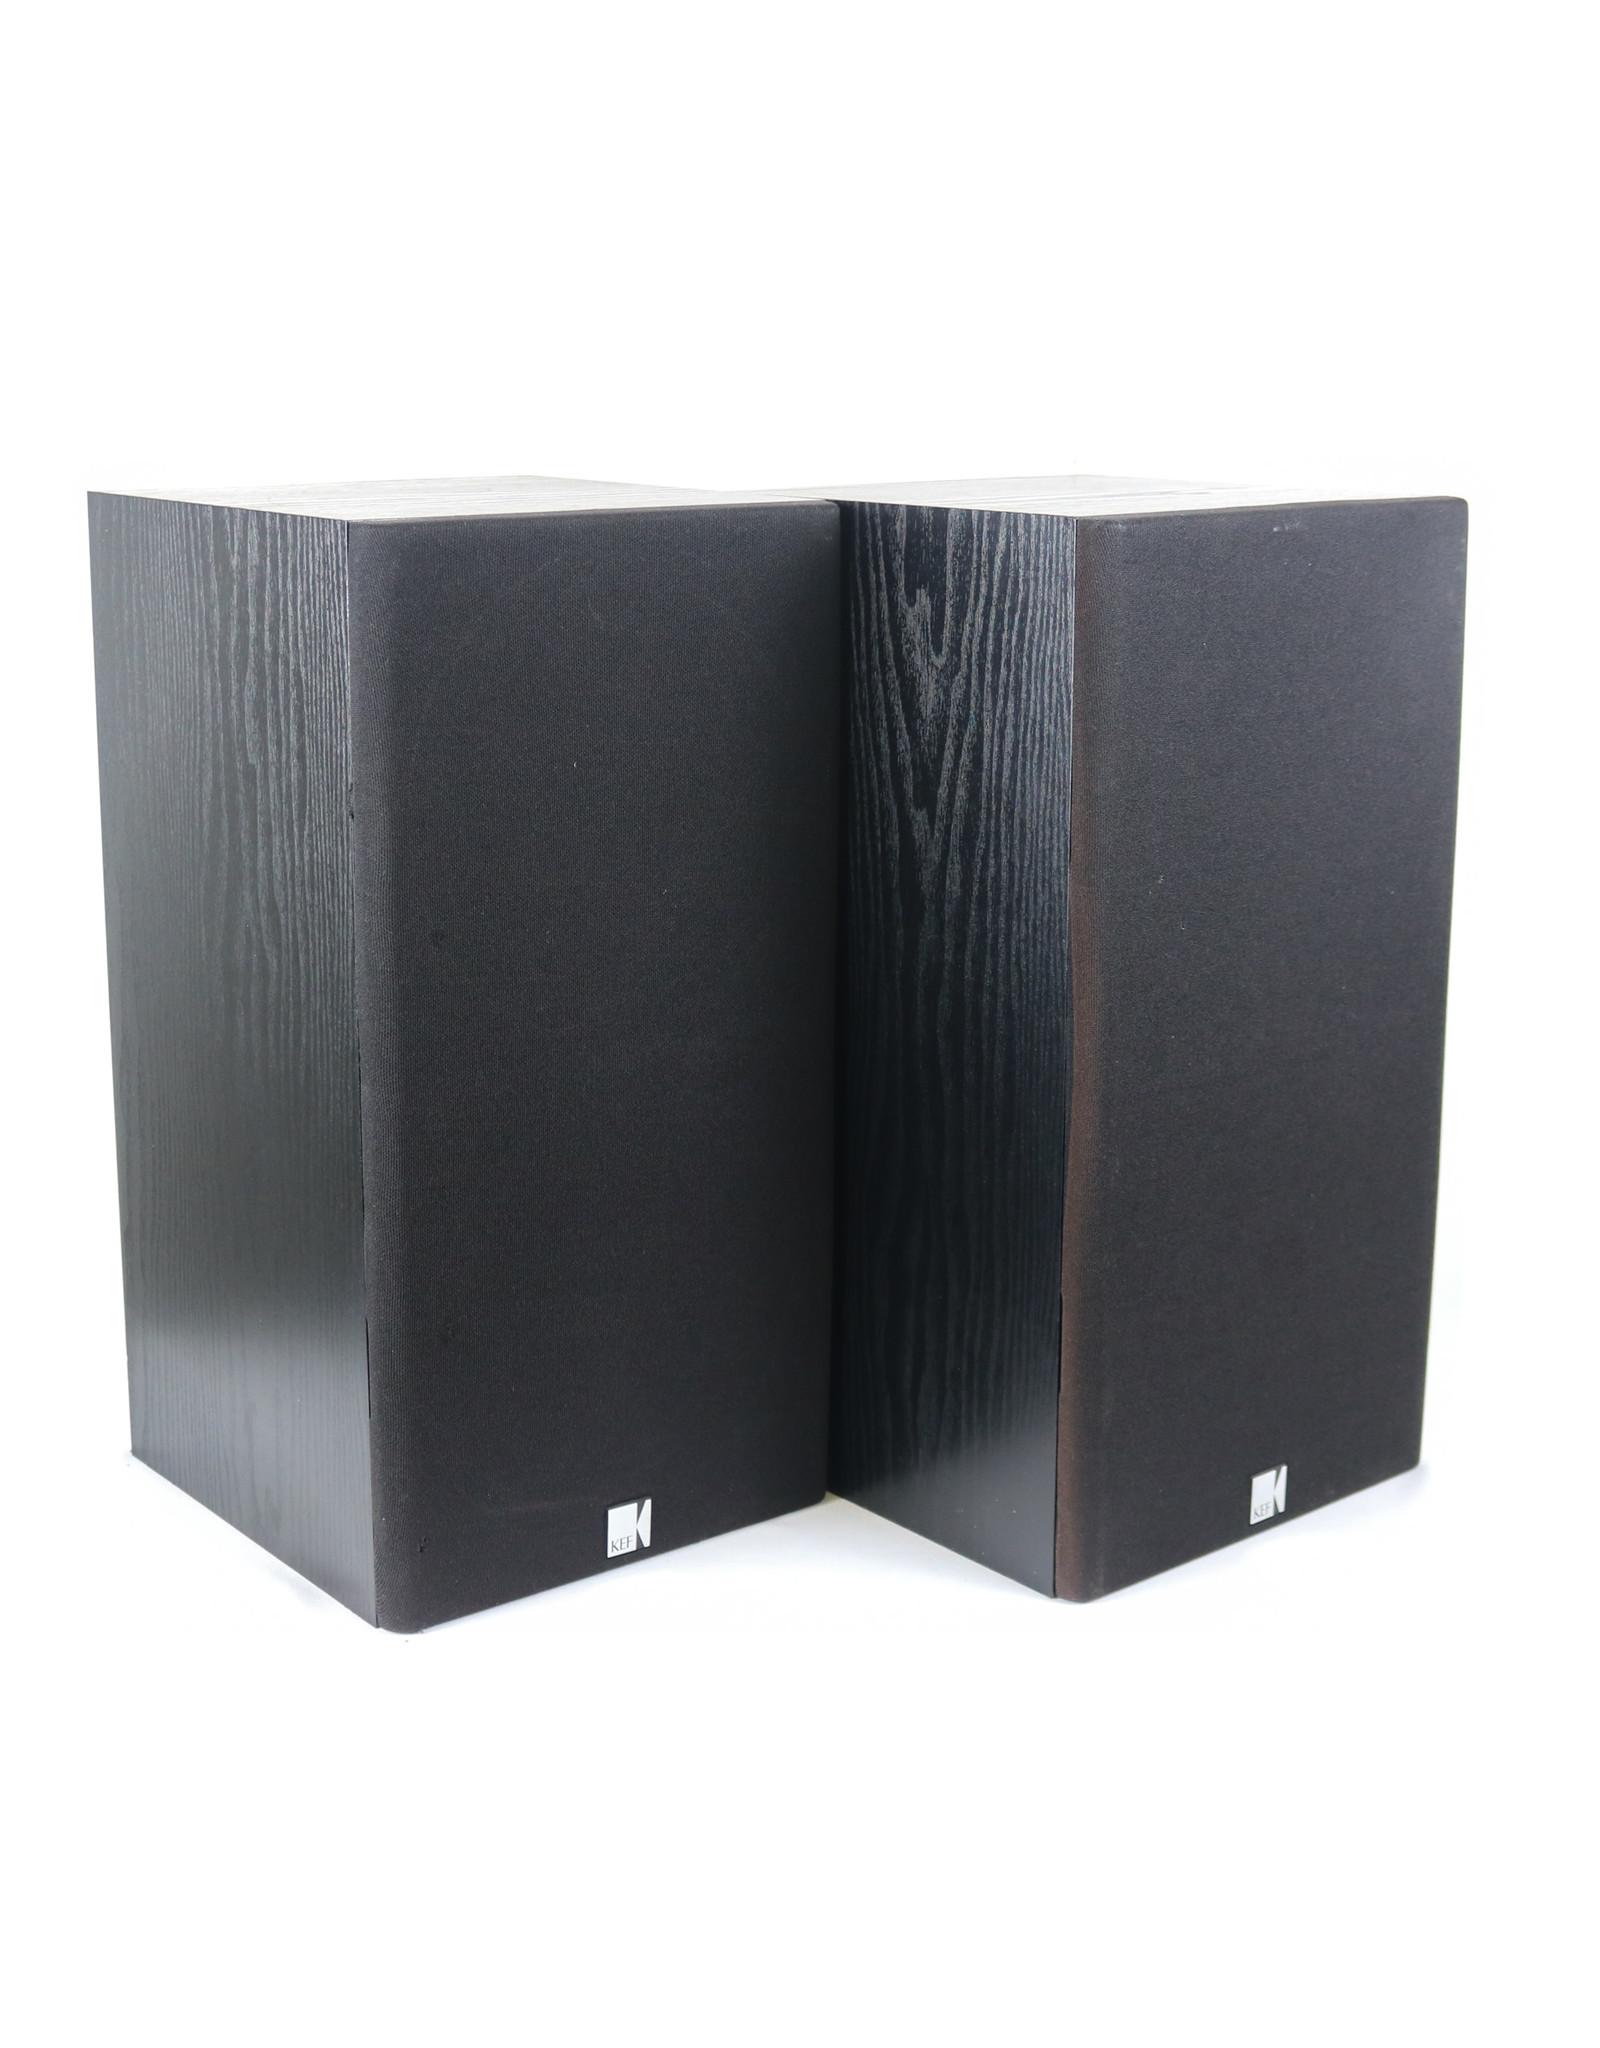 KEF KEF C55 Bookshelf Speakers Black USED